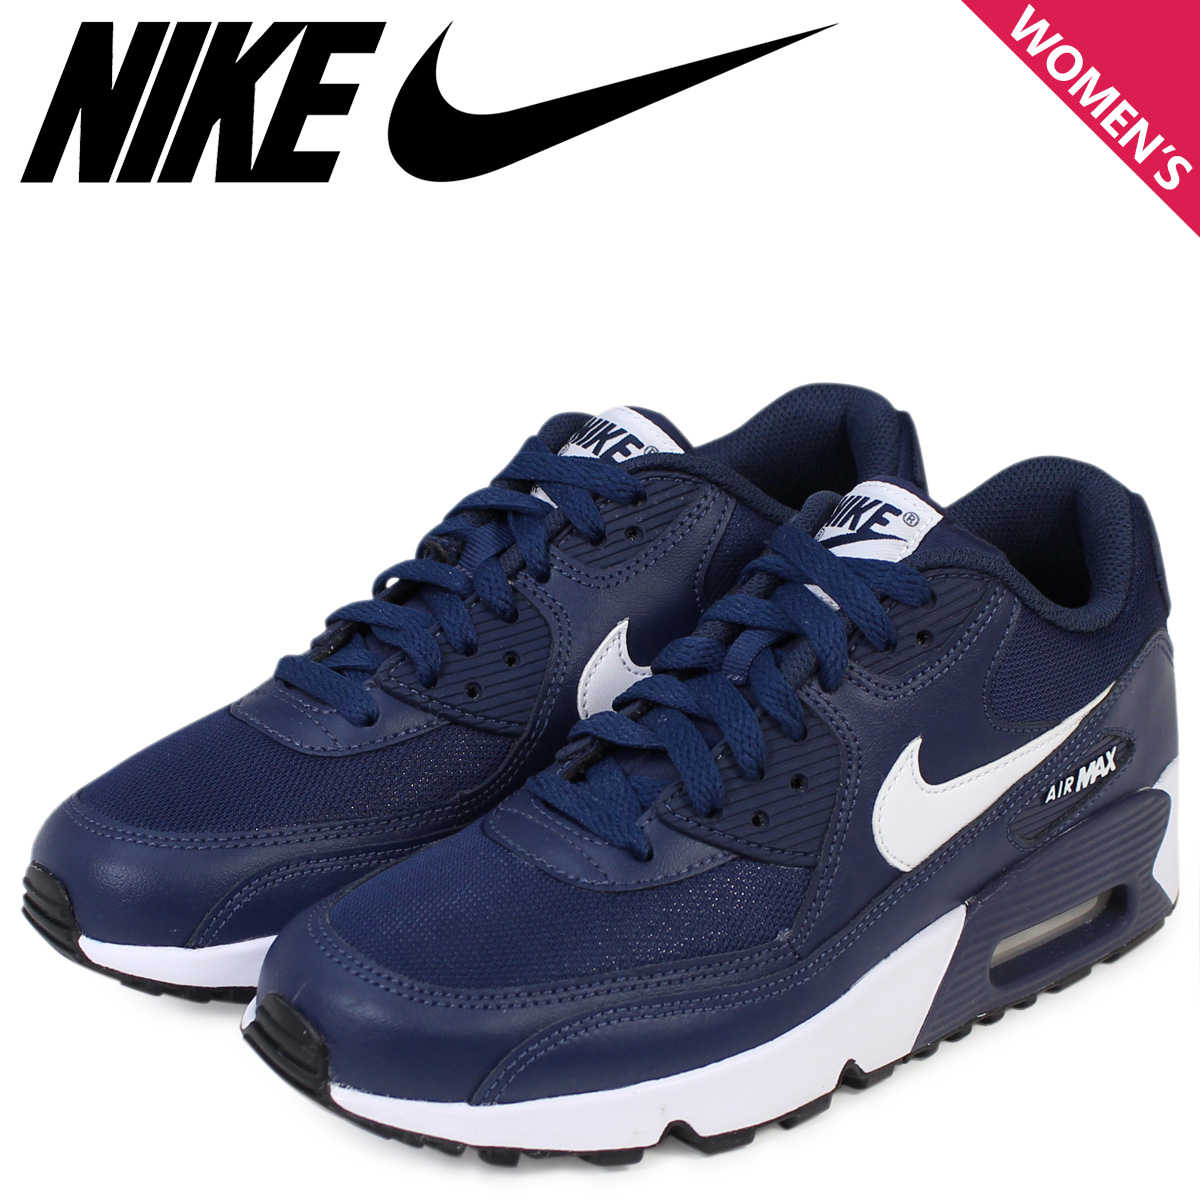 ALLSPORTS  Nike Air Max Womens NIKE sneakers AIR MAX 90 MESH GS Air Max  833418-400 shoes Navy  11   26 new in stock   05b204c31